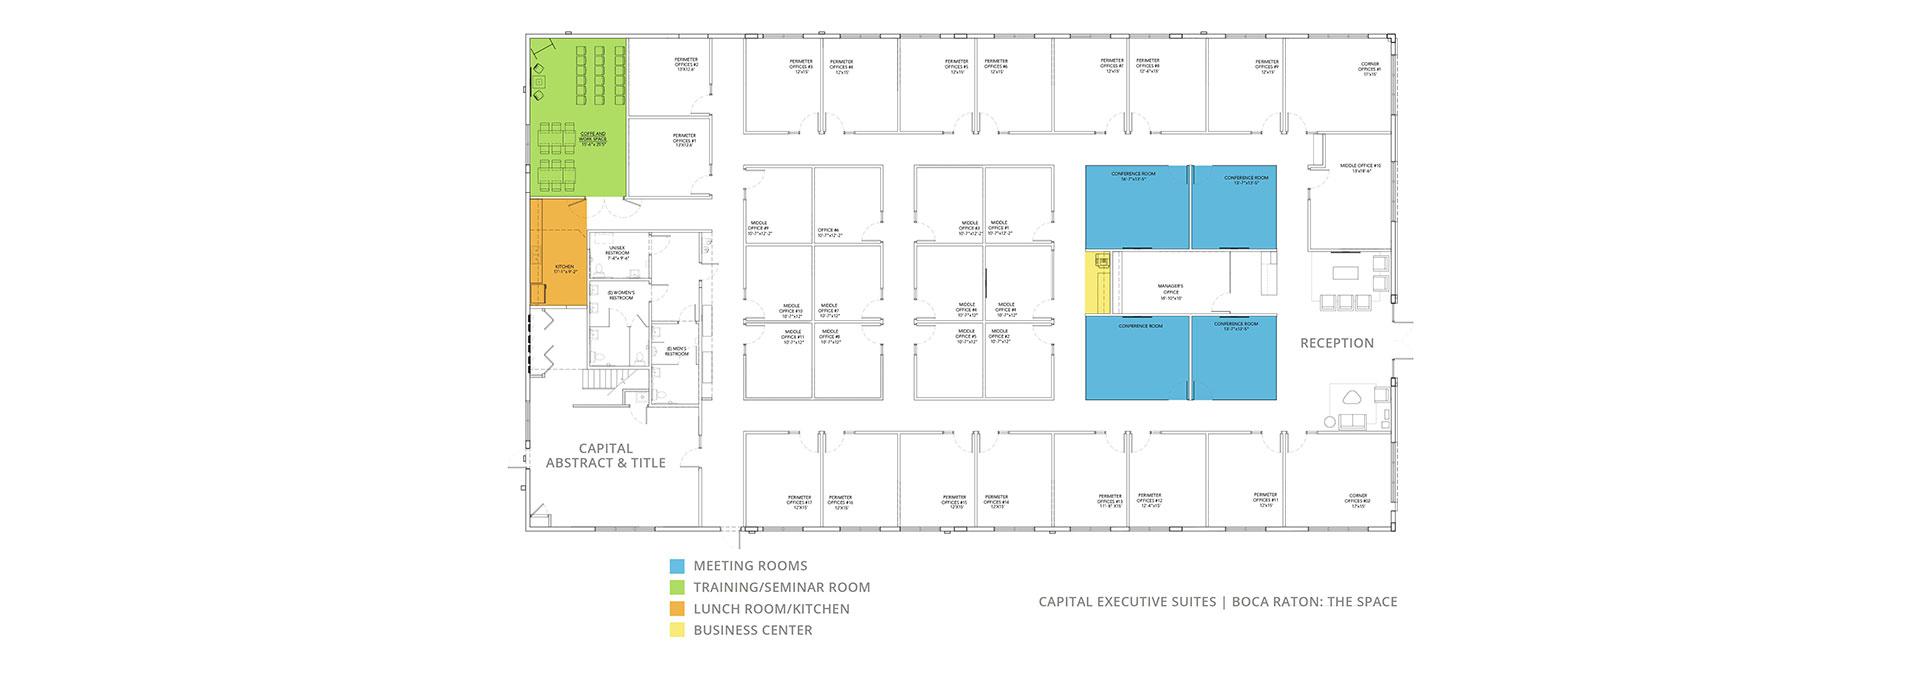 Boca Raton Floor Plan